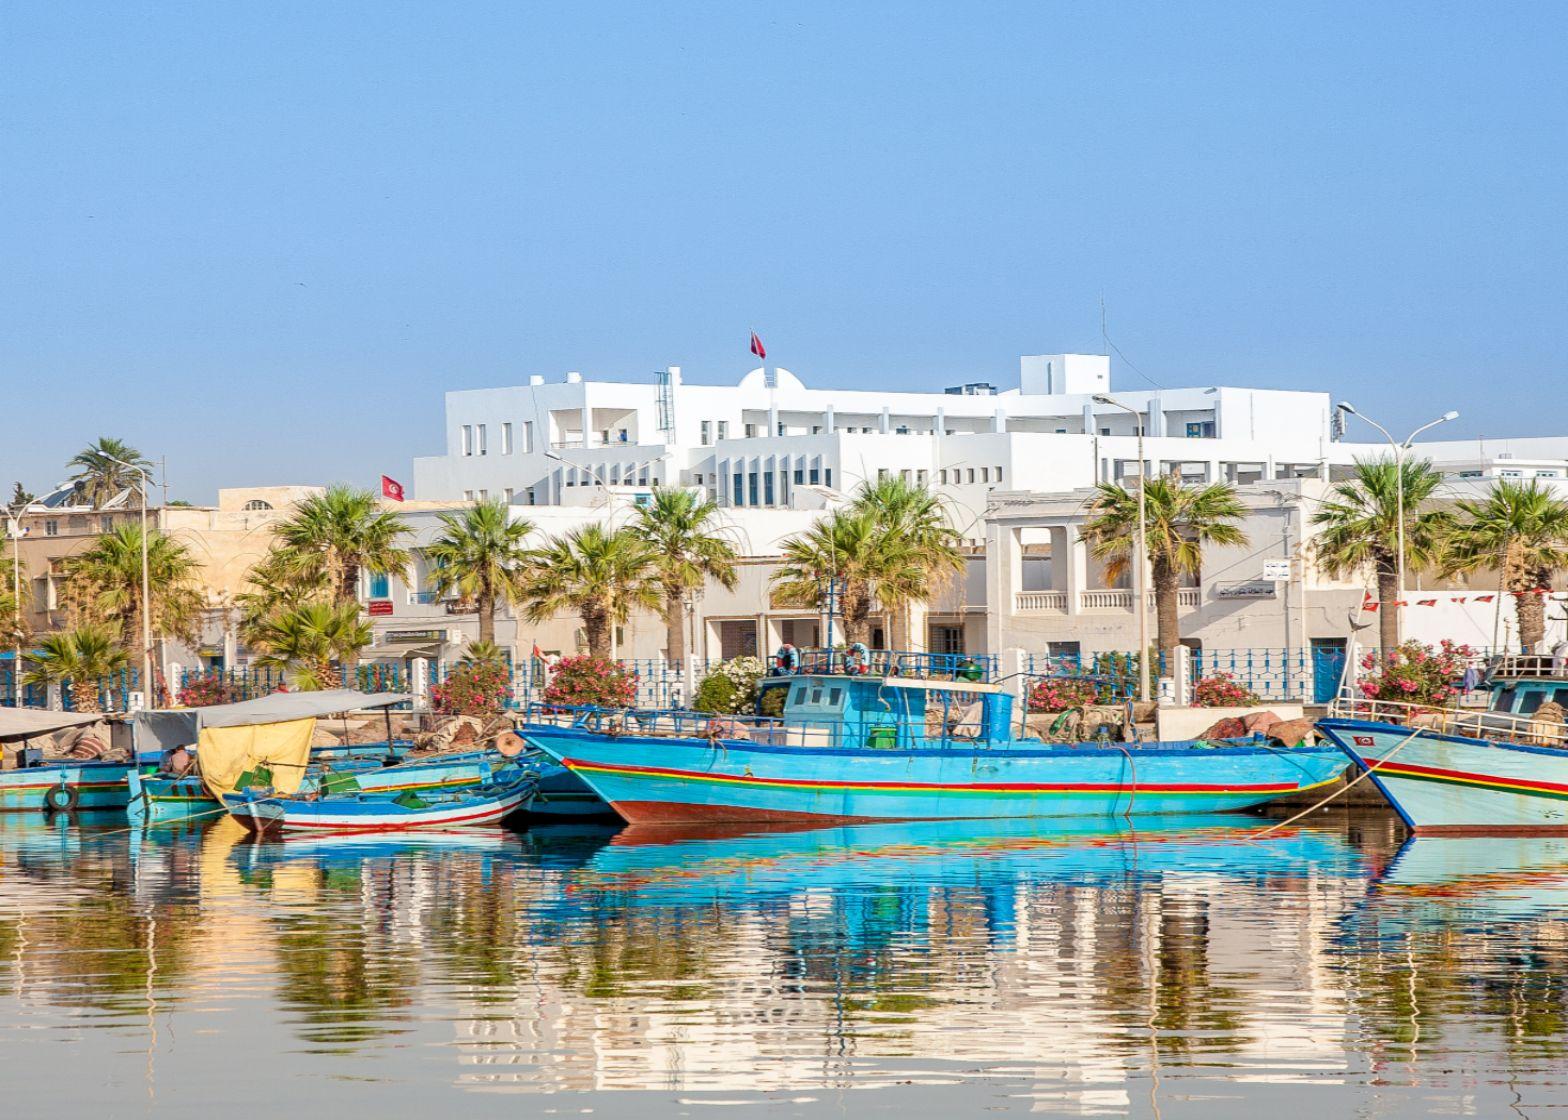 Mission économique en Tunisie